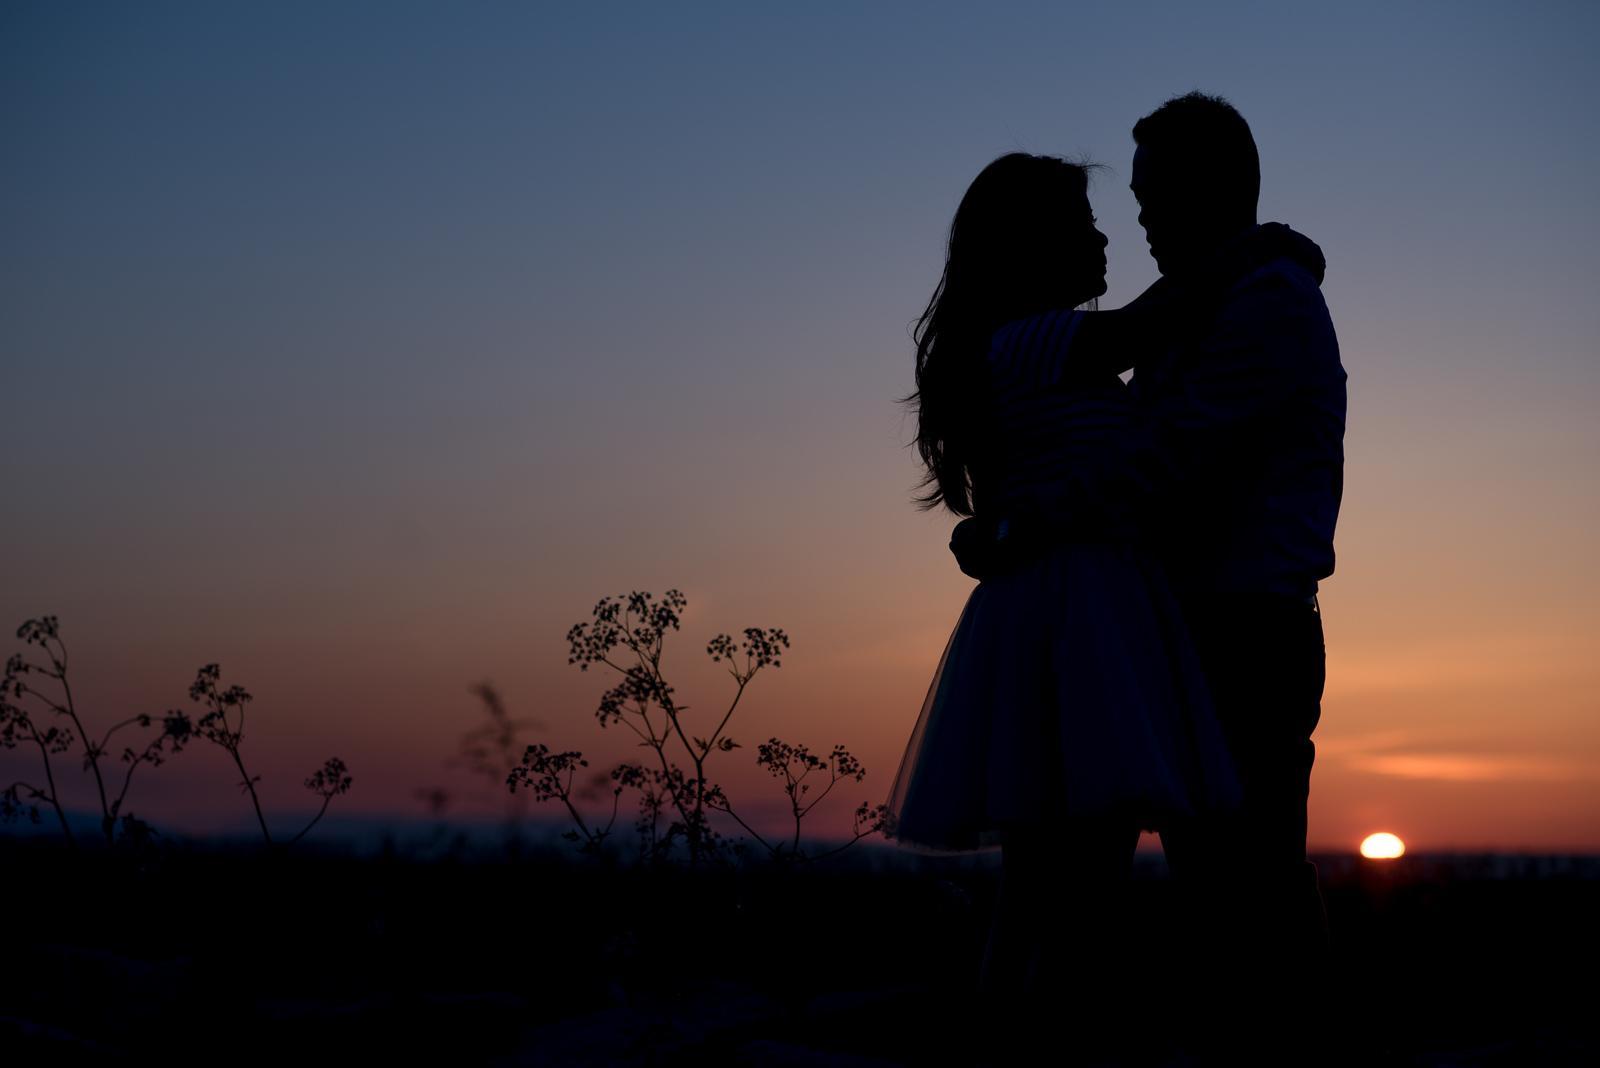 vancouver-island-wedding-photographers-terra-nova-park-engagement-richmond-17.jpg